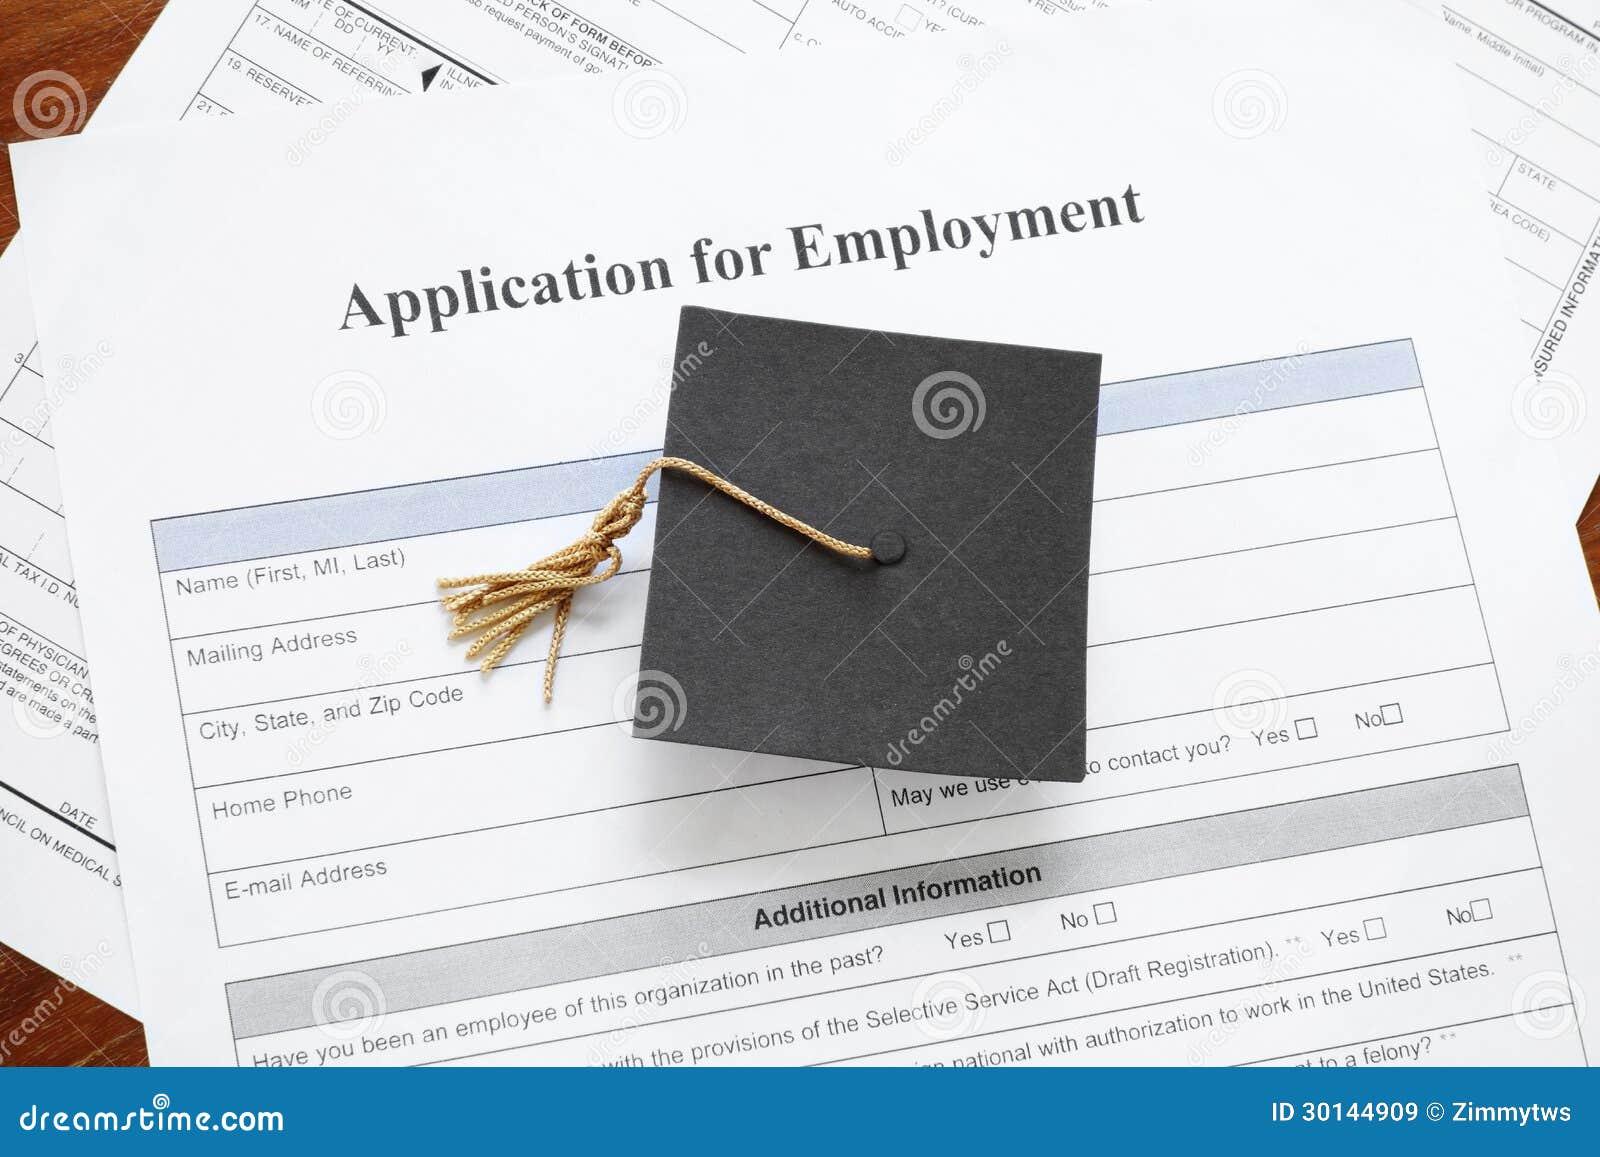 under armour job application form